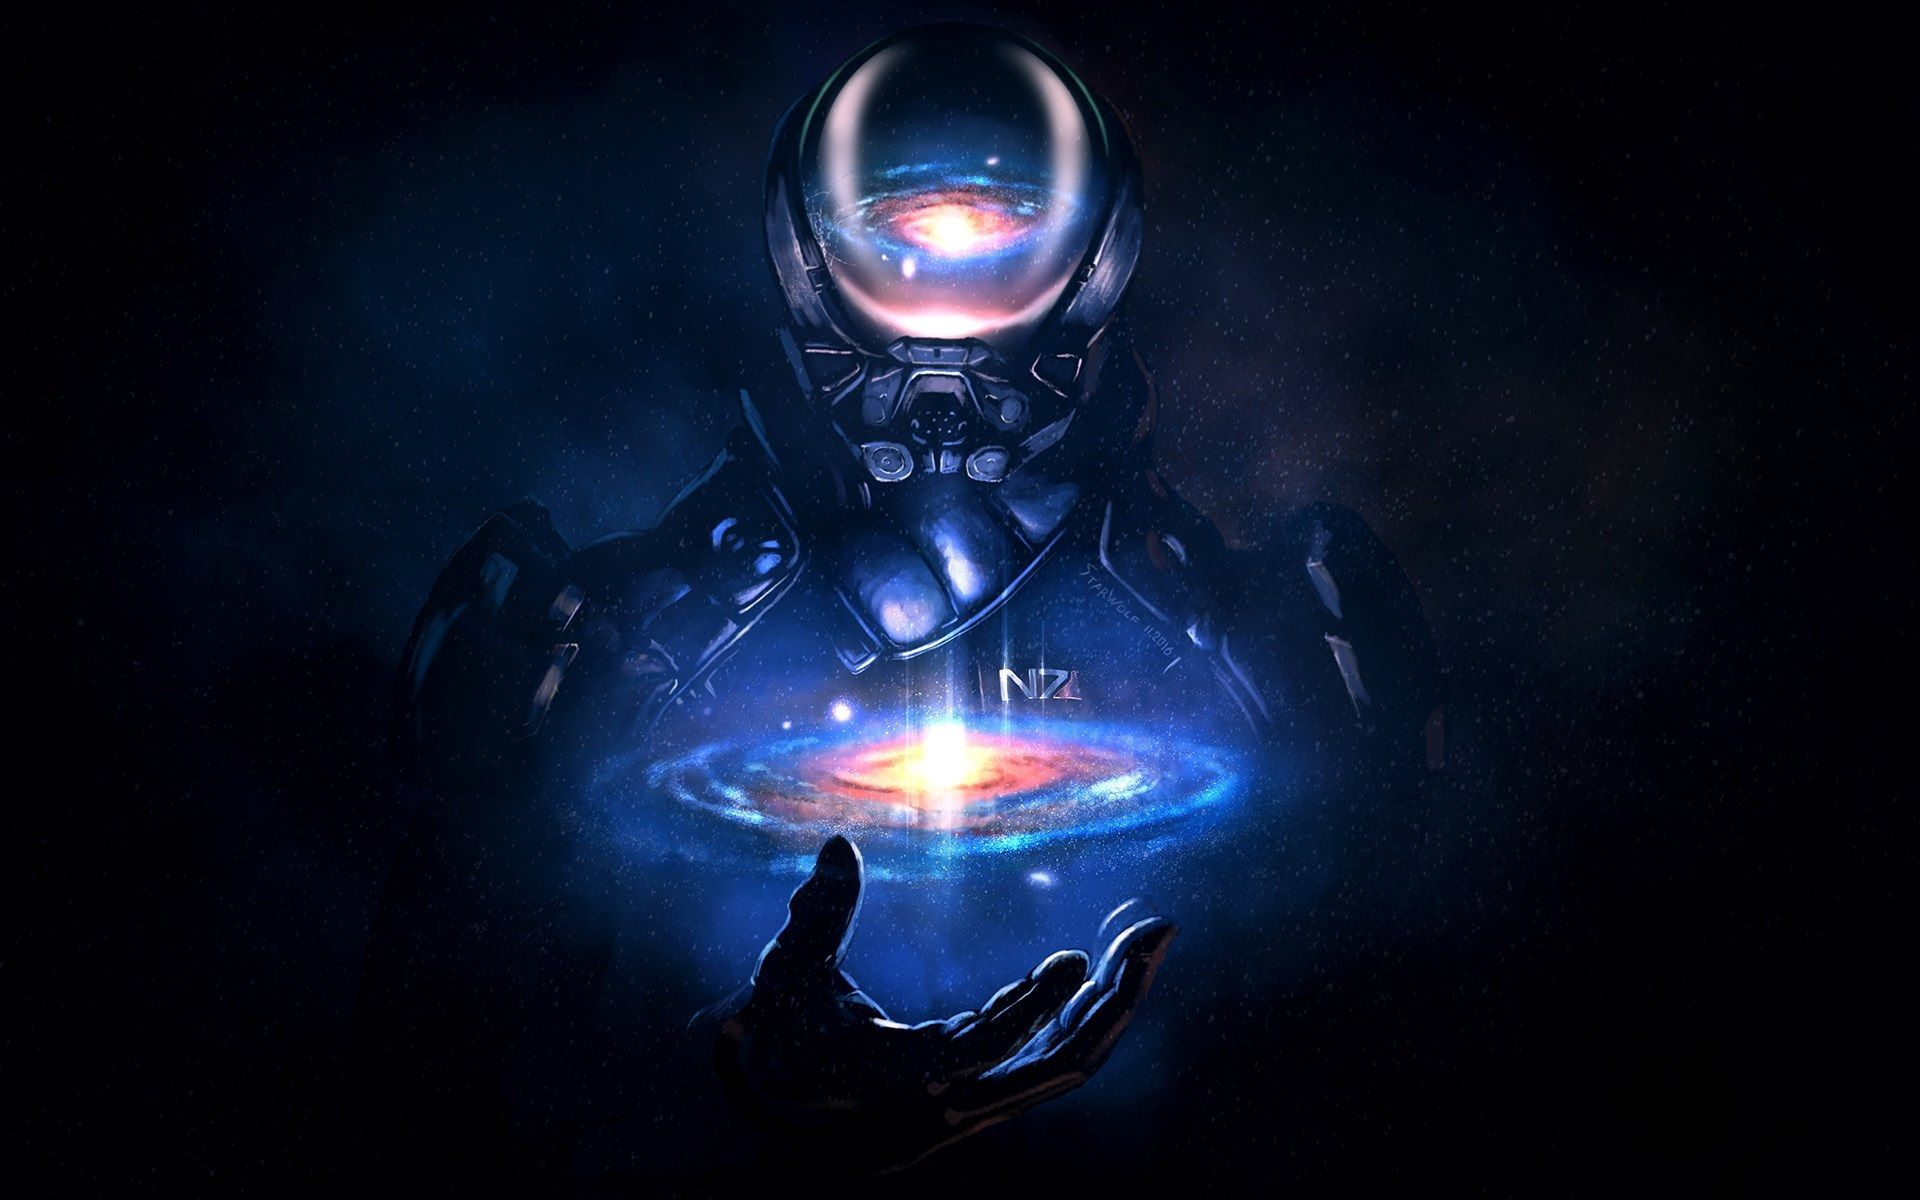 1920x1200 Mass Effect Andromeda Hd Wallpaper Download Free Mass Effect Art Wallpaper Andromeda Mass Effect